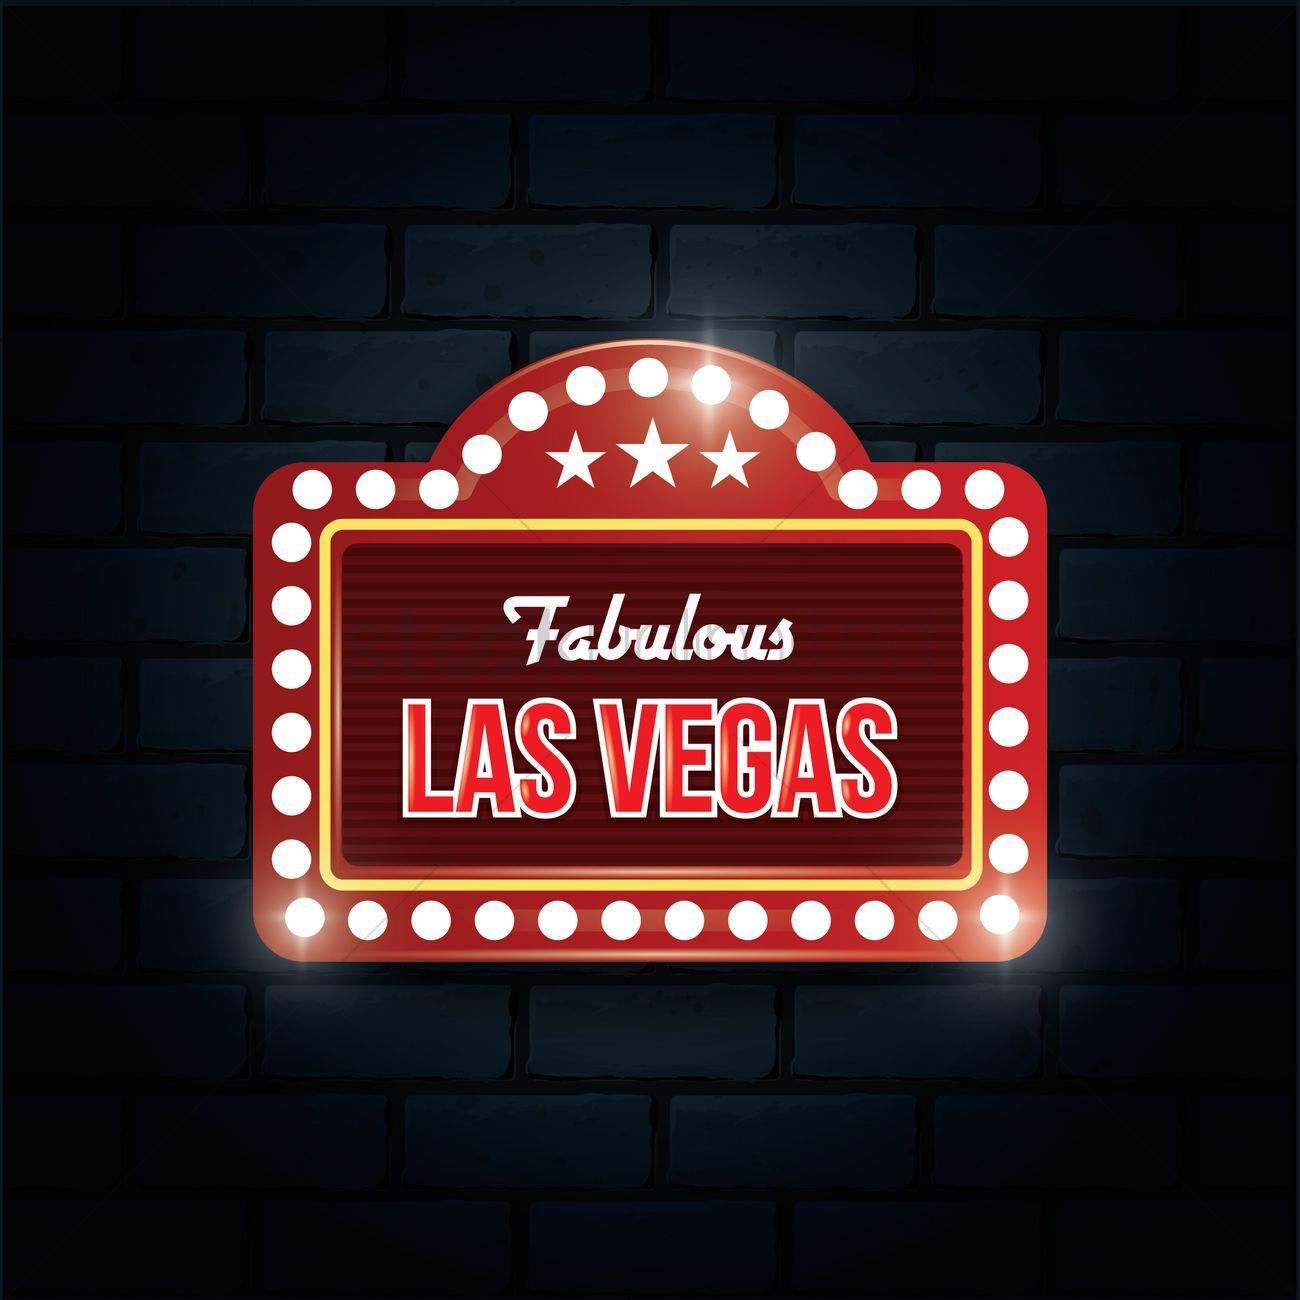 1300x1300 Fabulous Las Vegas Sign Vector Image